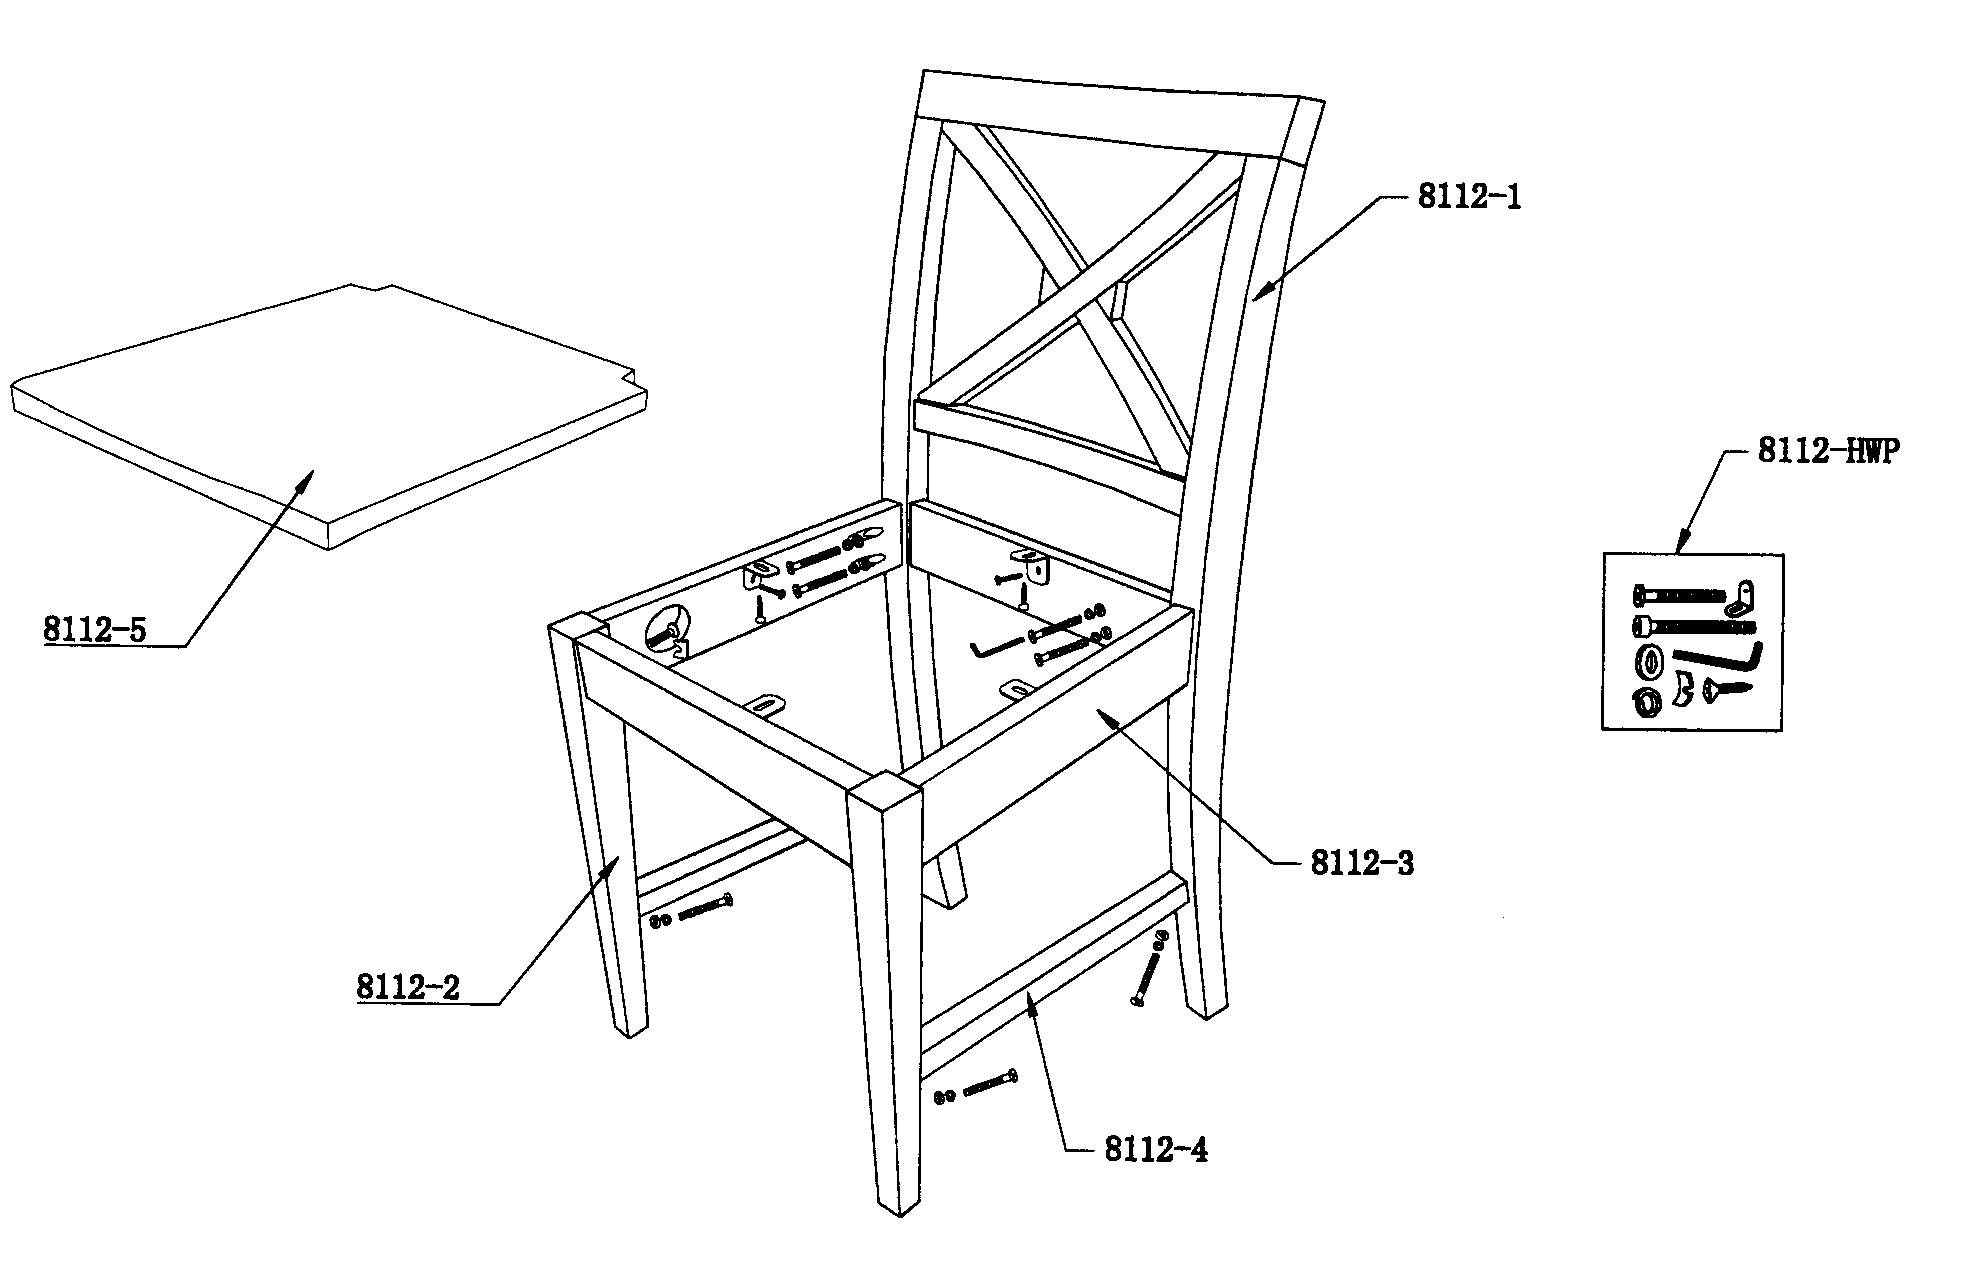 office chair diagram black velvet covers wiring parts hublands end model 8112 furniture genuine ntgm075ega3